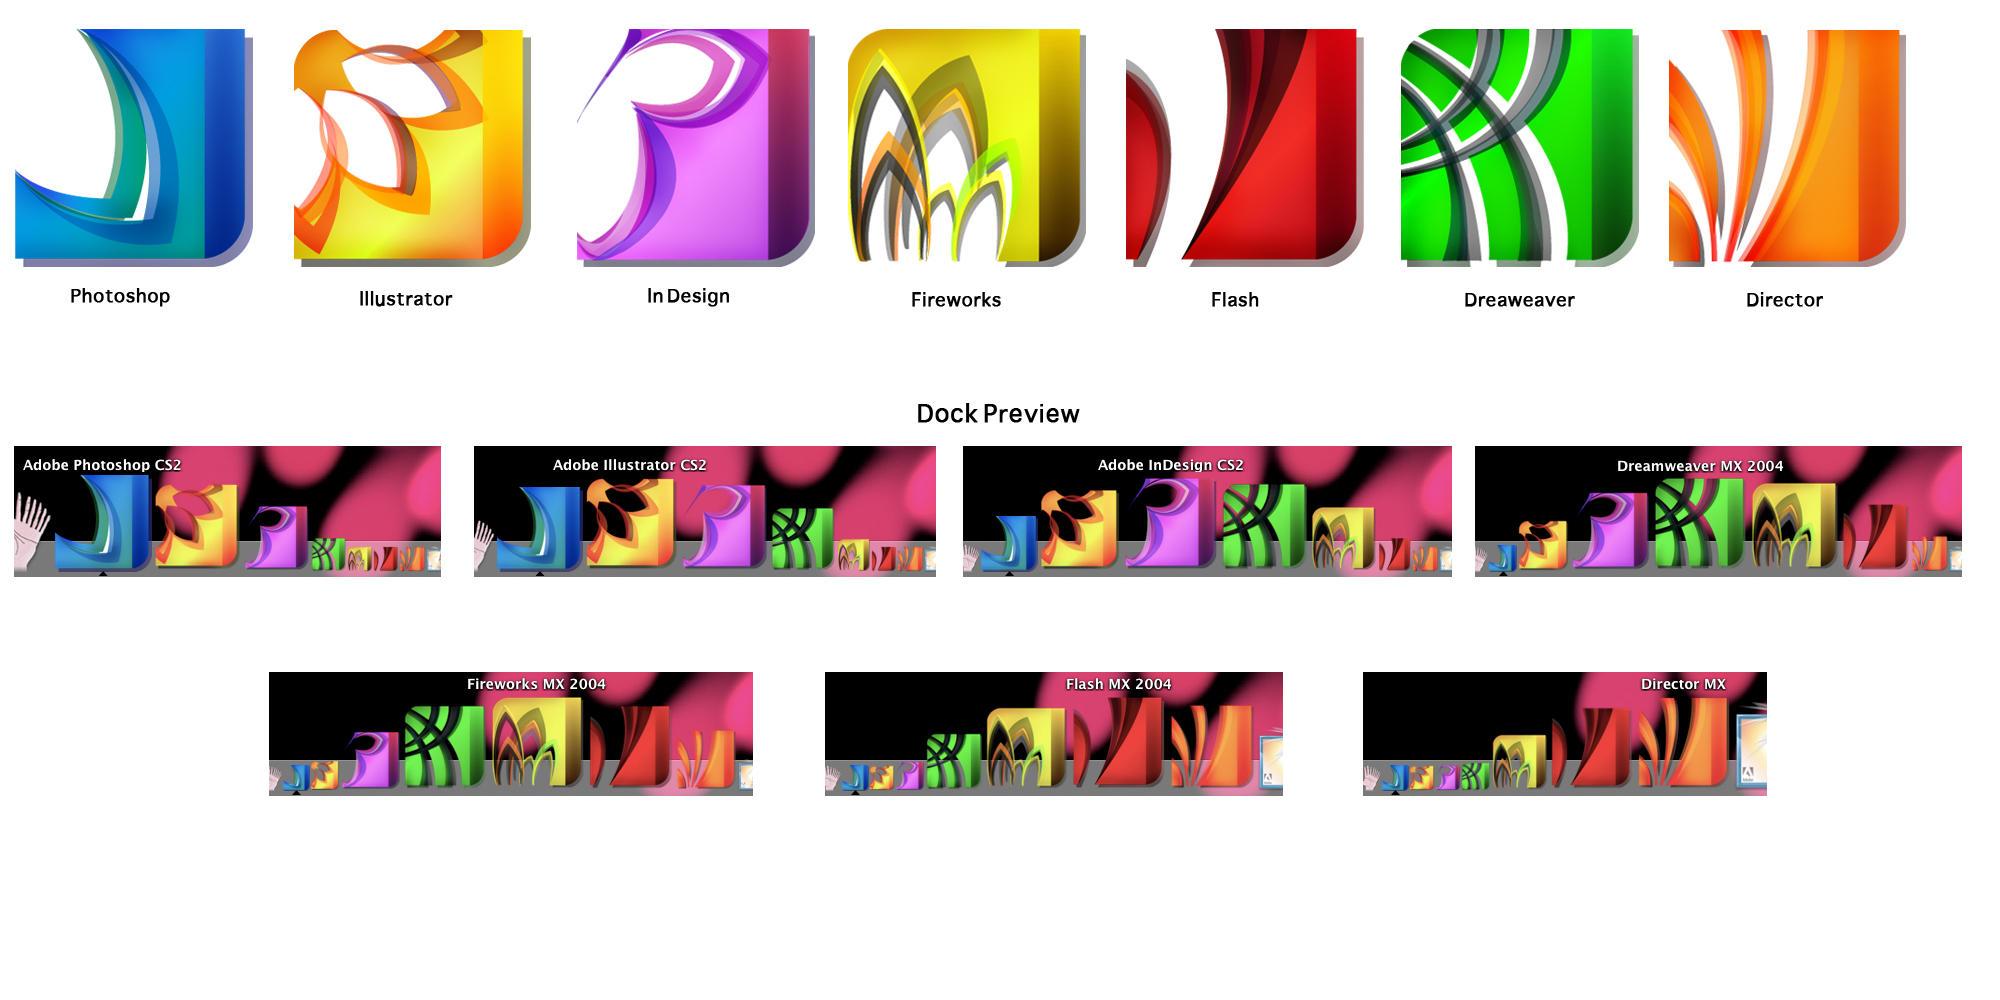 Adobe Programs Icons For Mac By Silverartemisia On Deviantart